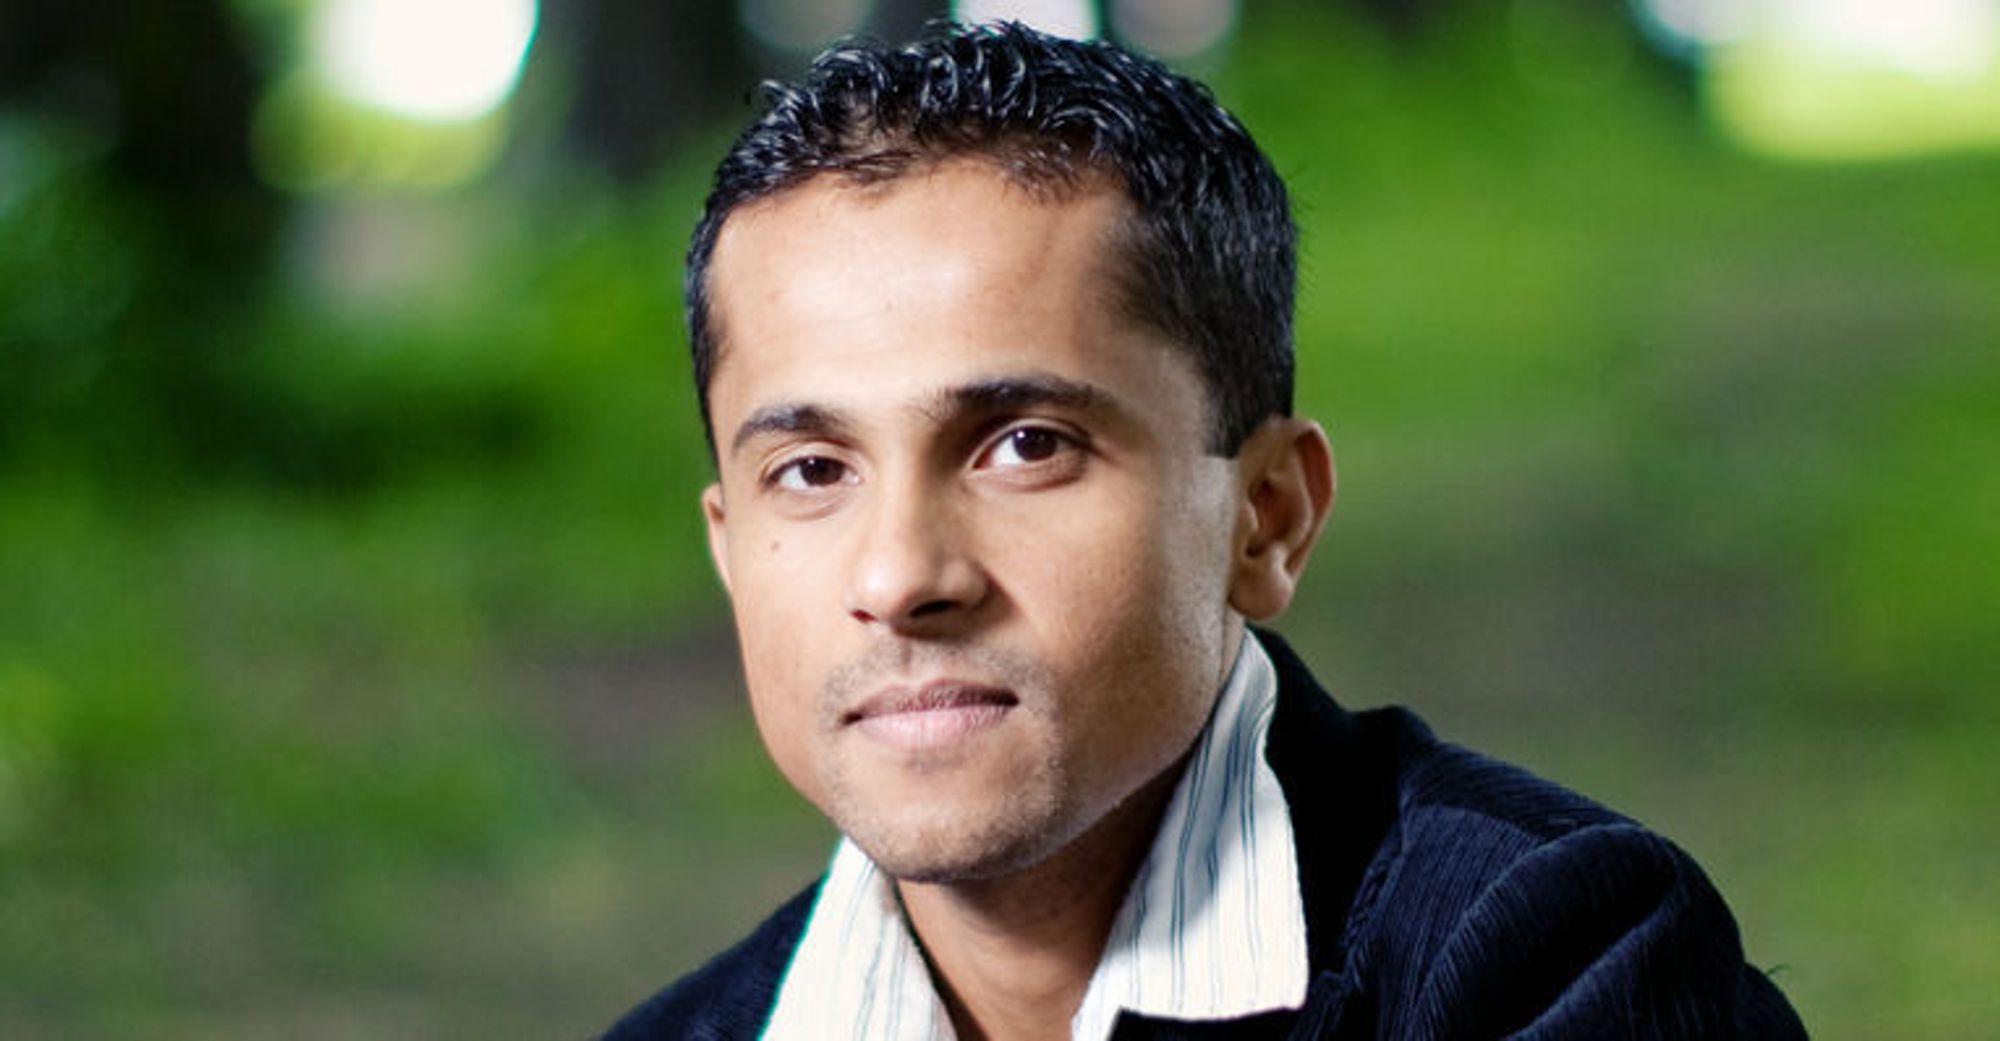 Redaktør Majoran Vivekananthan i Utrop.